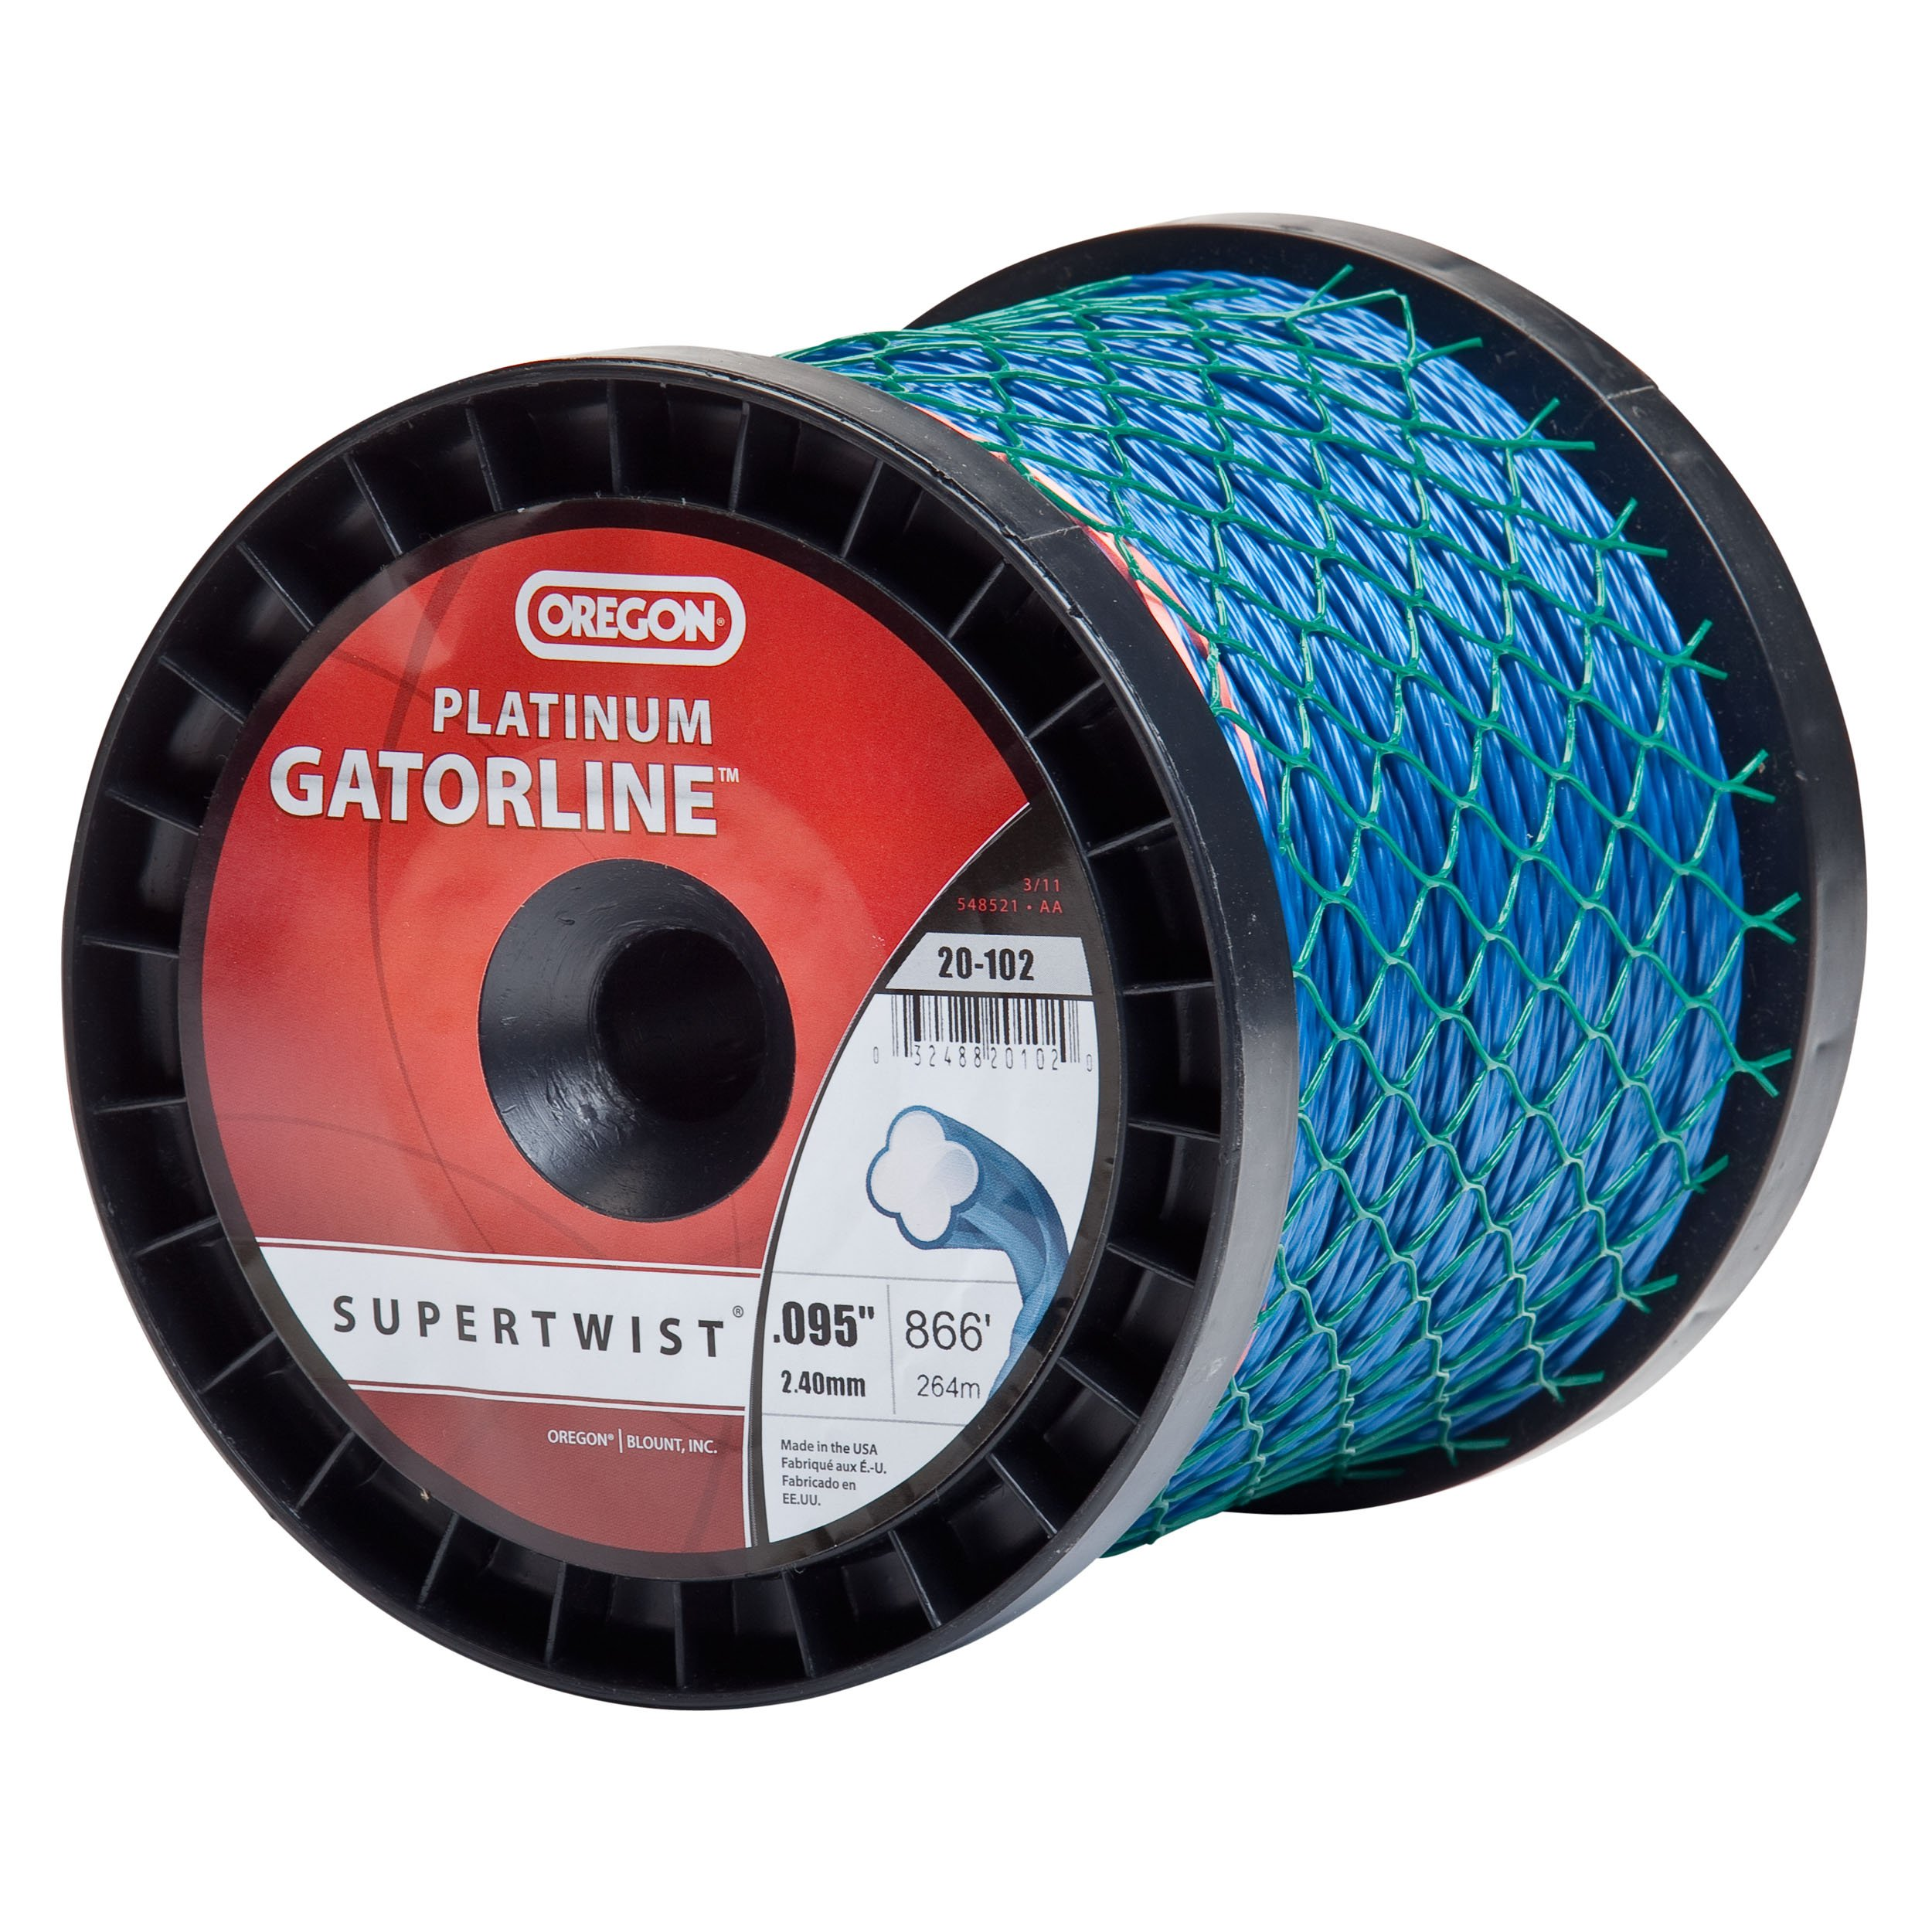 Oregon 20-102 Platinum Gatorline 3-Pound Spool String Trimmer Line 0.095-Inch Gauge by Oregon